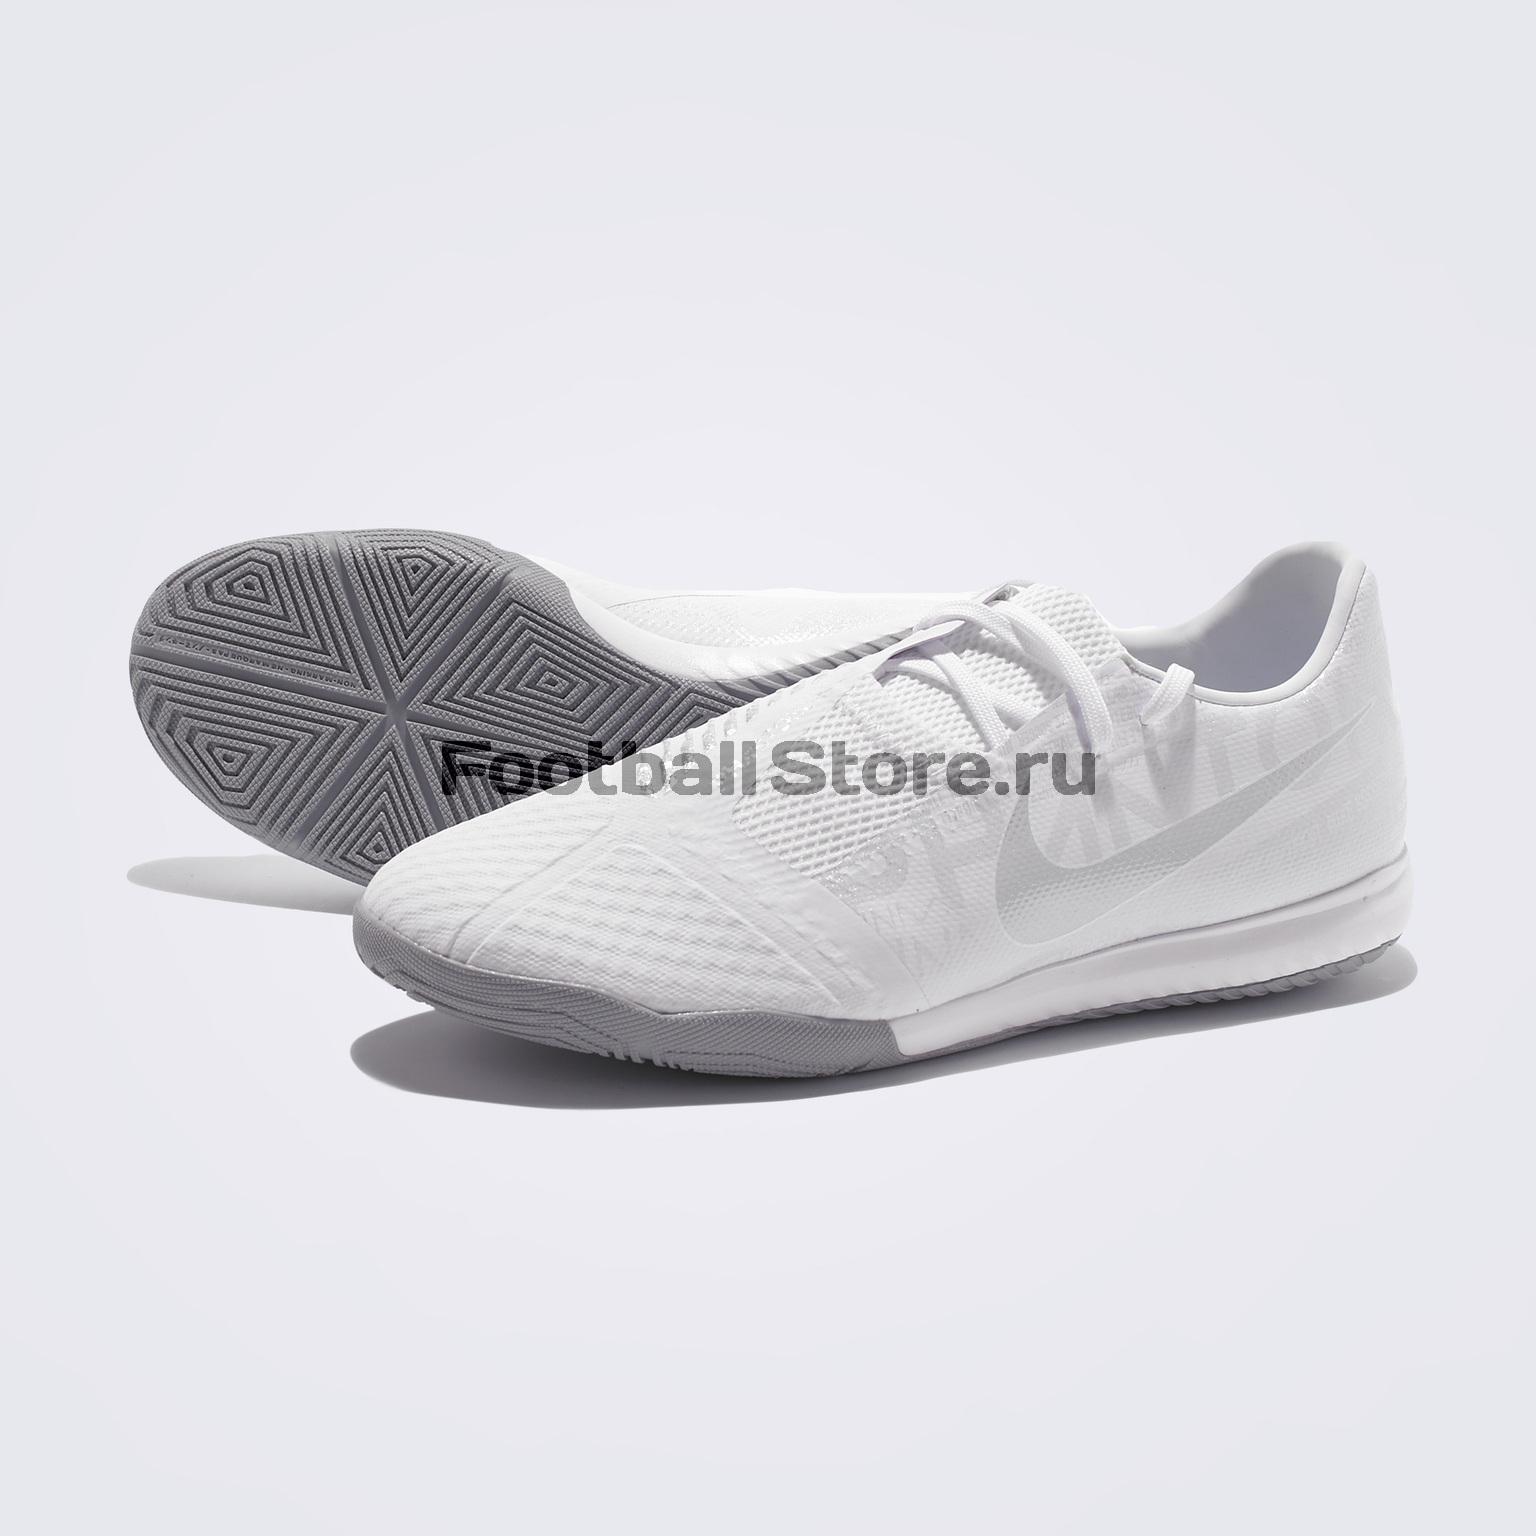 Футзалки Nike Phantom Venom Academy IC AO0570-100